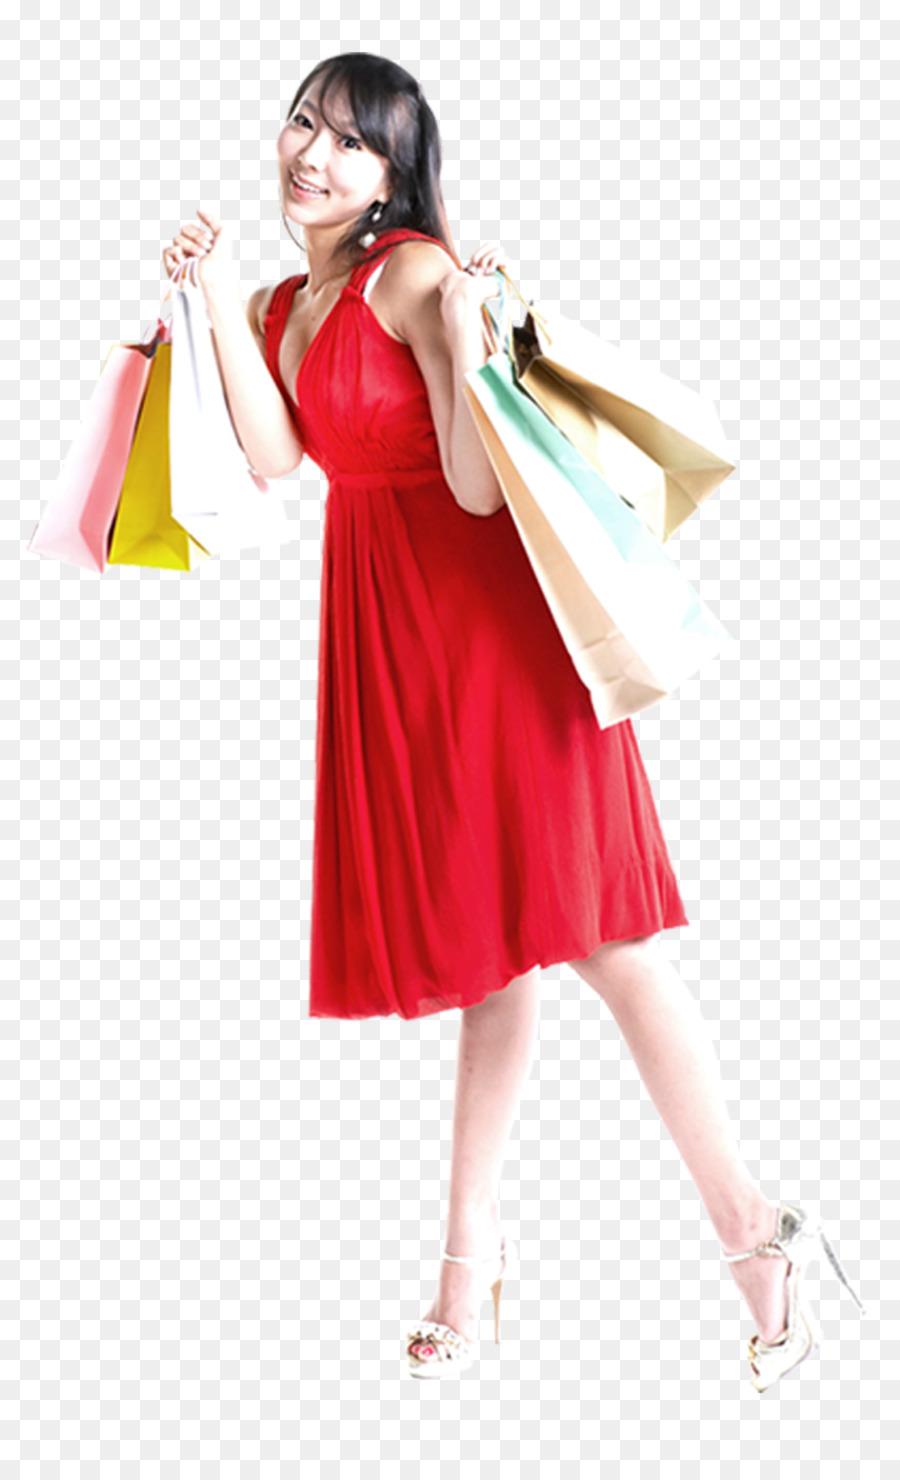 Gift Shopping Red Clip art - Beautiful red dress shopping png ...